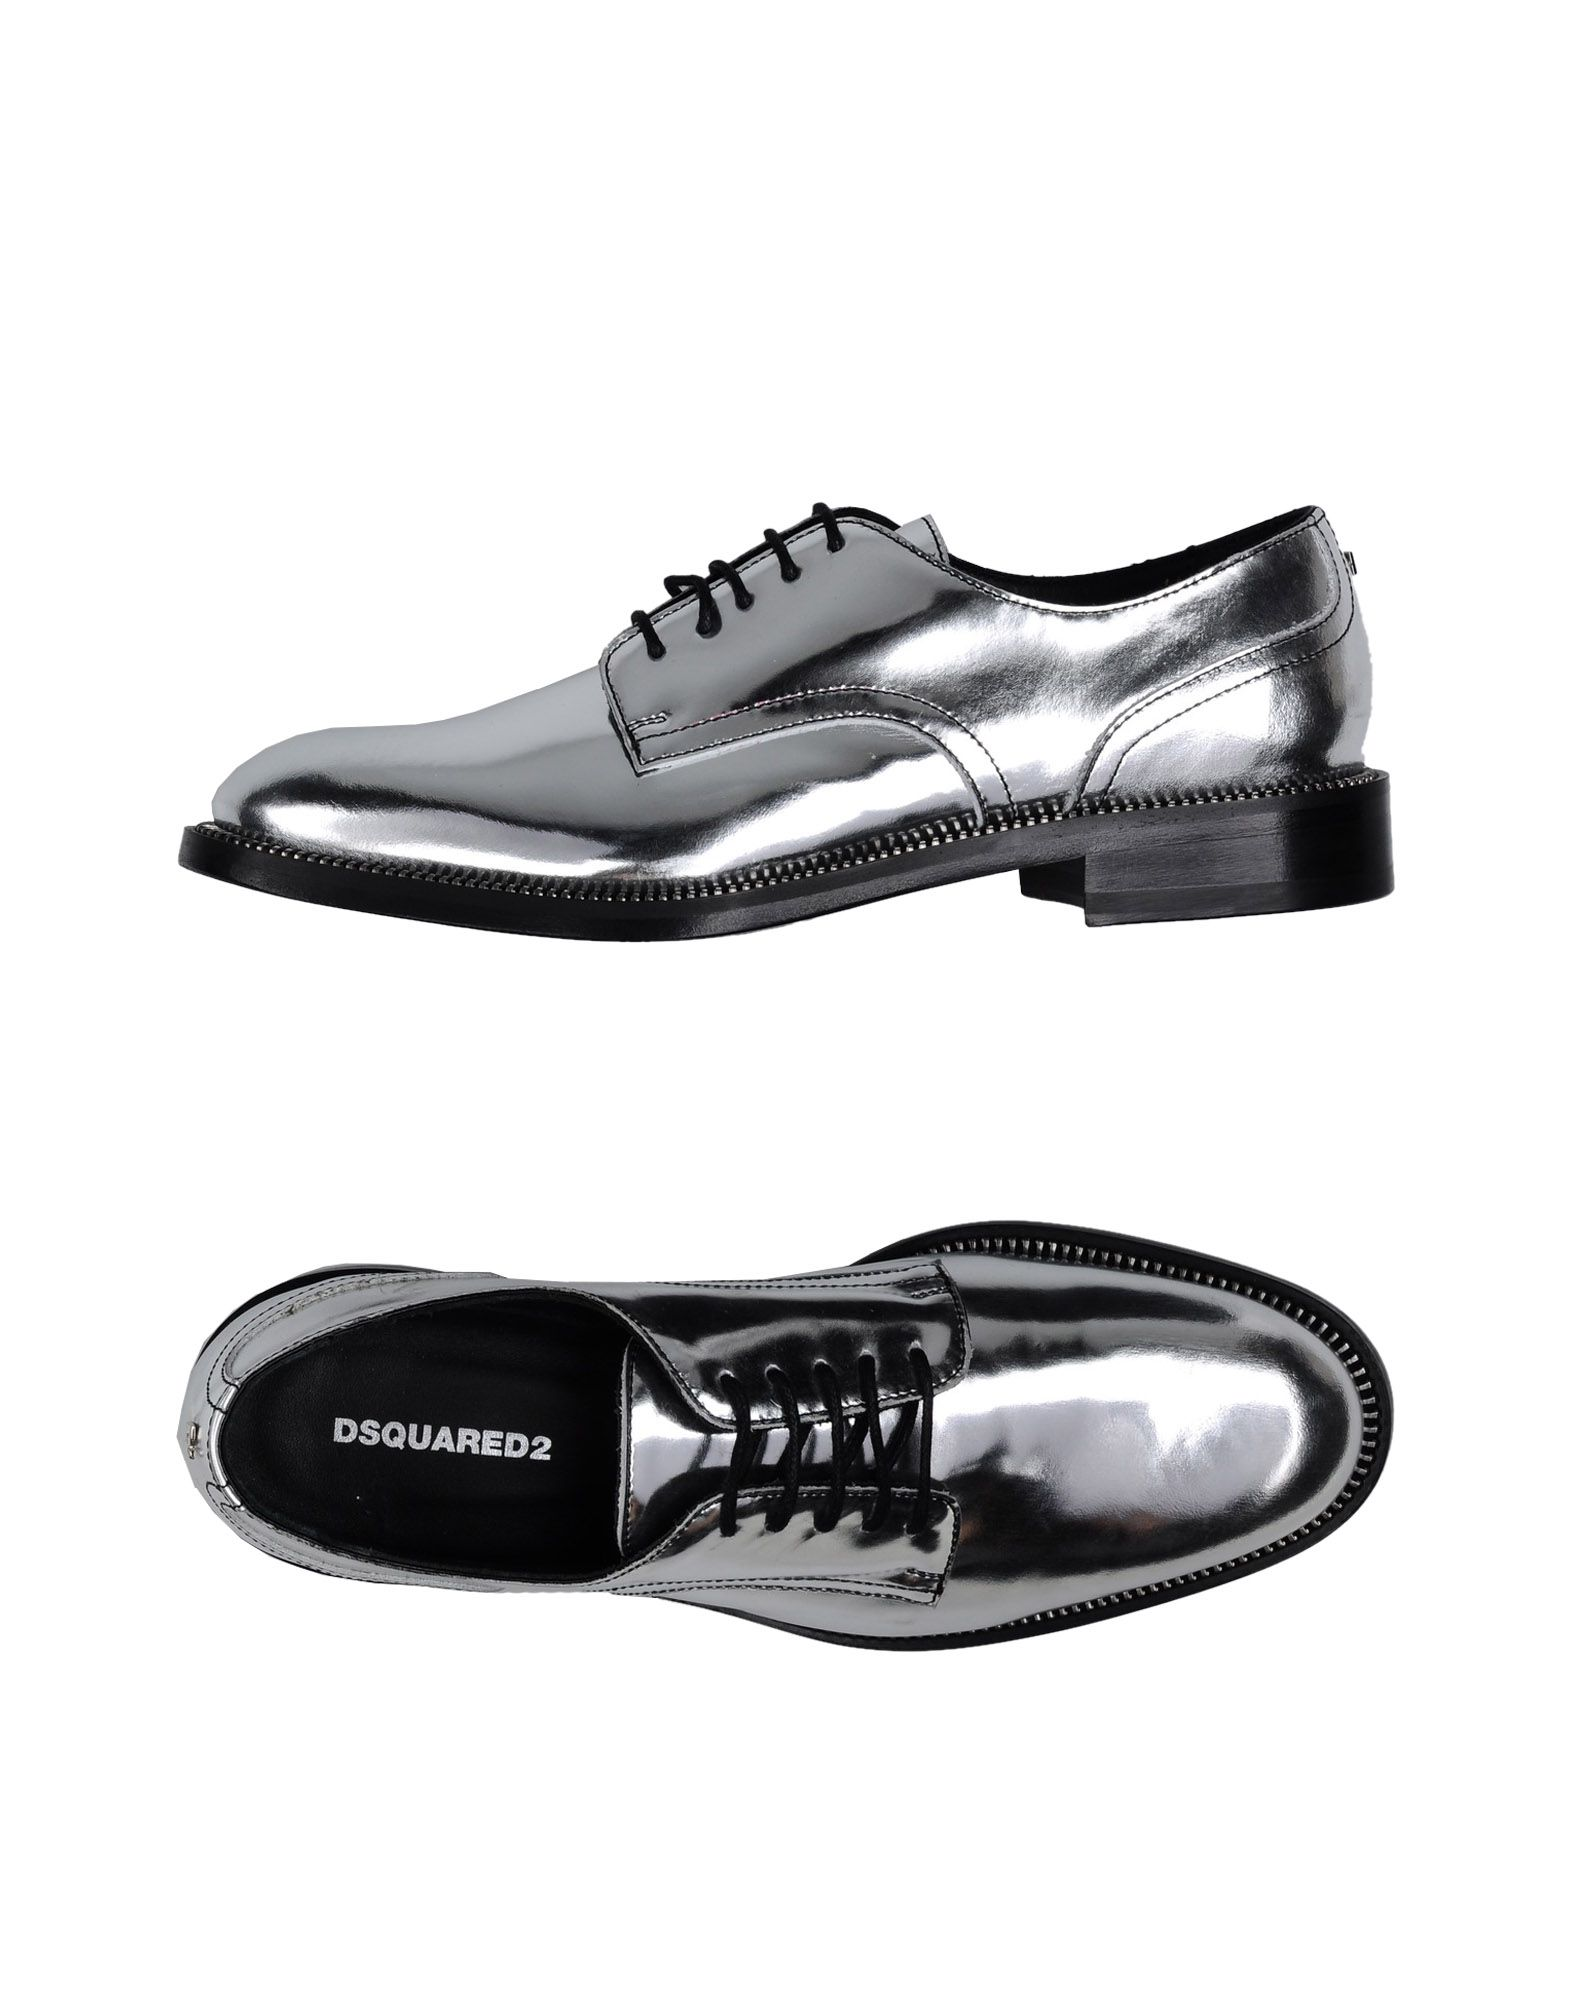 Rabatt  Schuhe Dsquared2 Schnürschuhe Damen  Rabatt 11291515ES bbce31